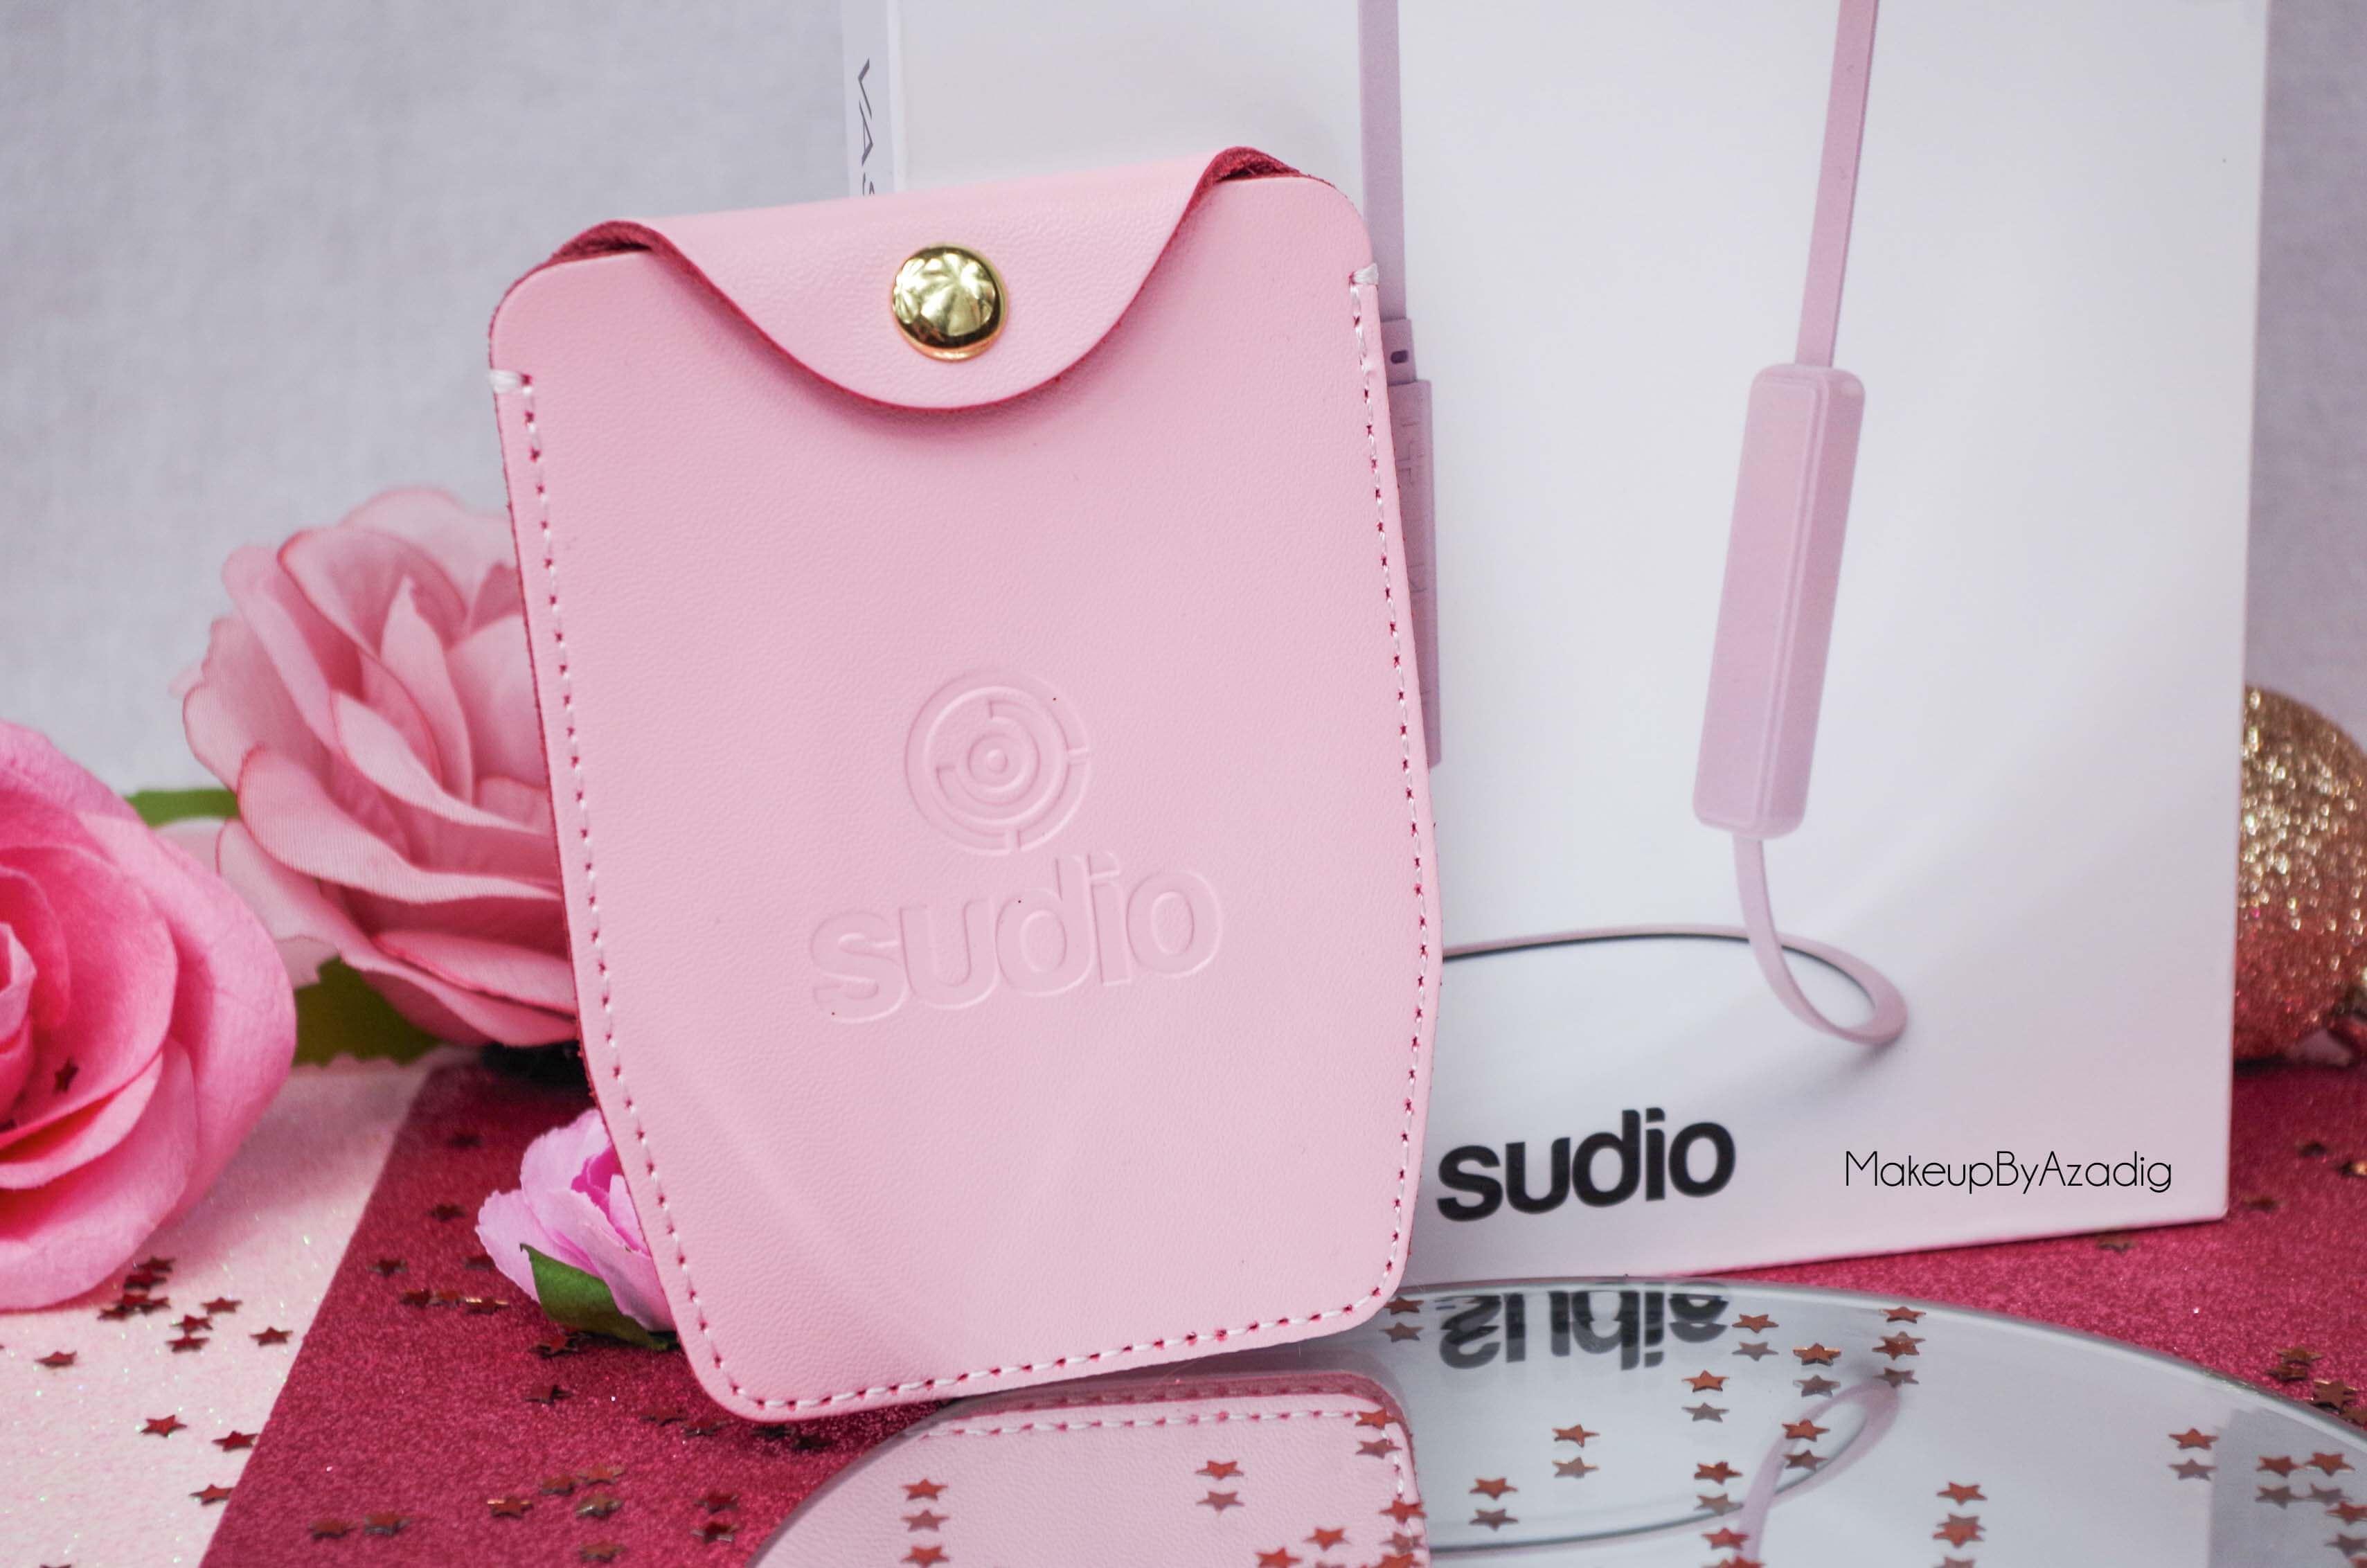 ecouteurs-casque-sans-fil-bluetooth-design-tendance-sudio-sweden-rose-vasa-bla-makeupbyazadig-avis-prix-pochette-cuir